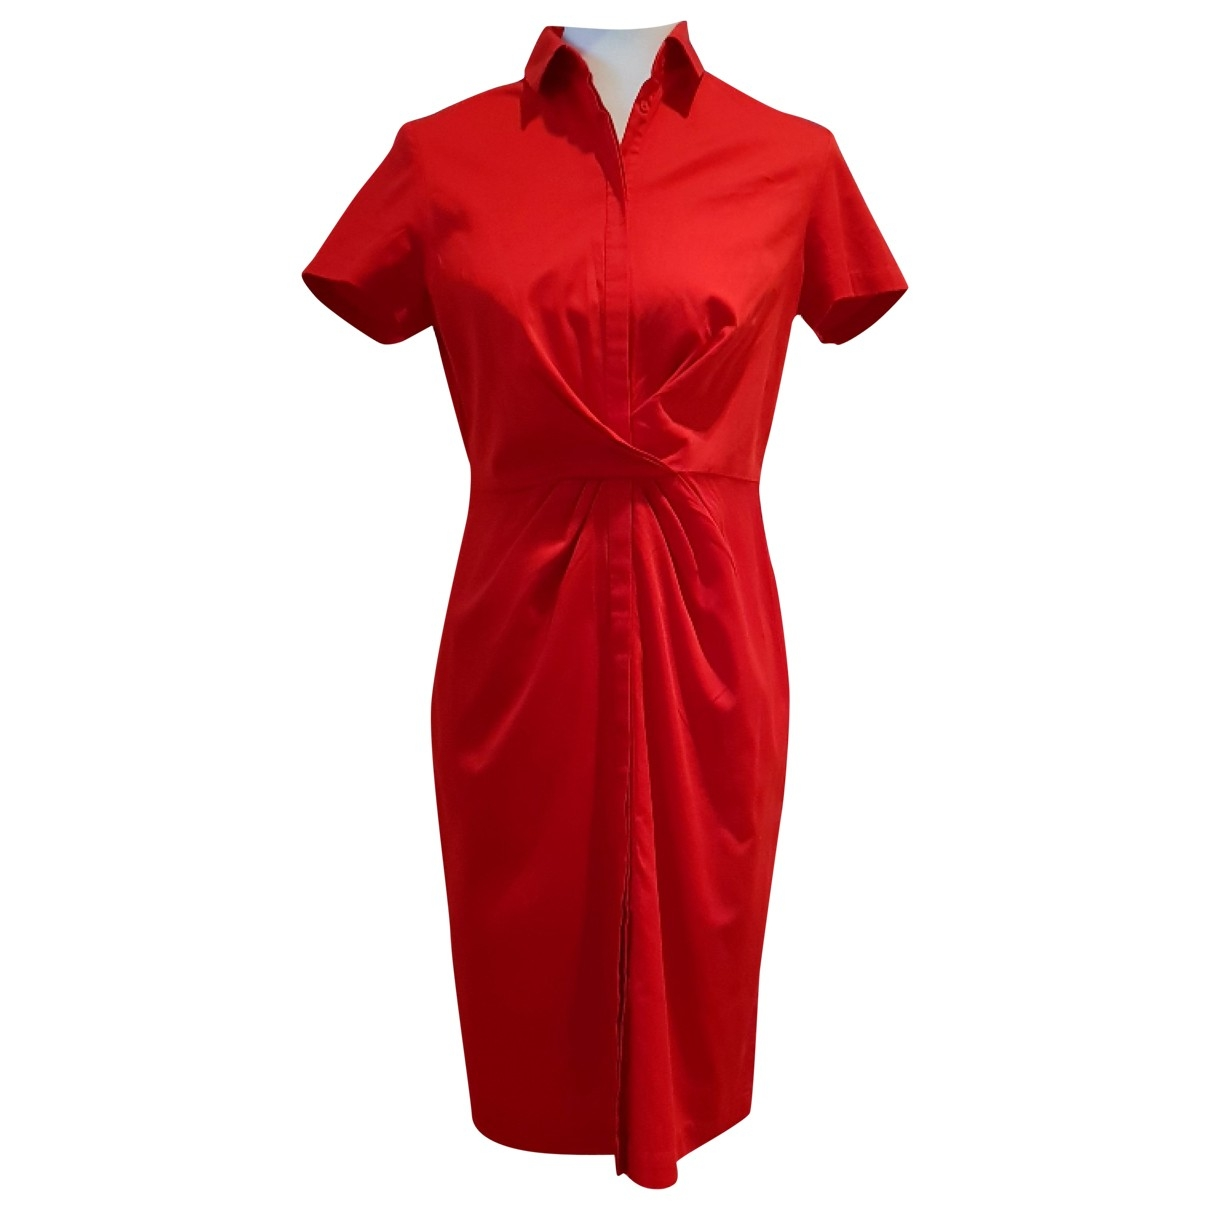 Boss \N Red Cotton dress for Women S International